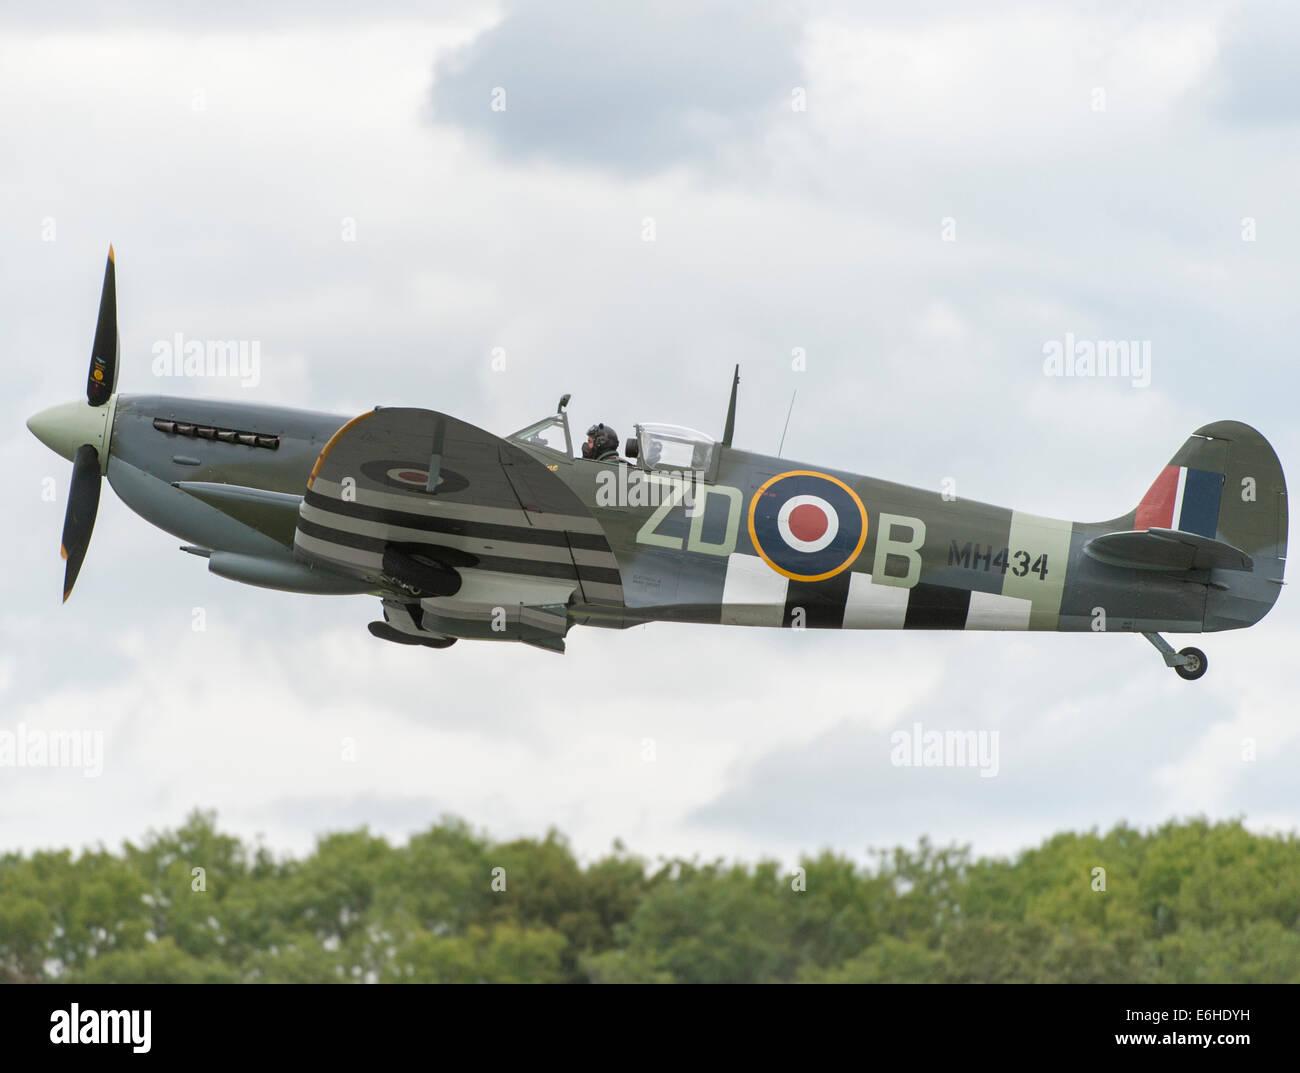 dunsfold-aerodrome-surrey-uk-saturday-23